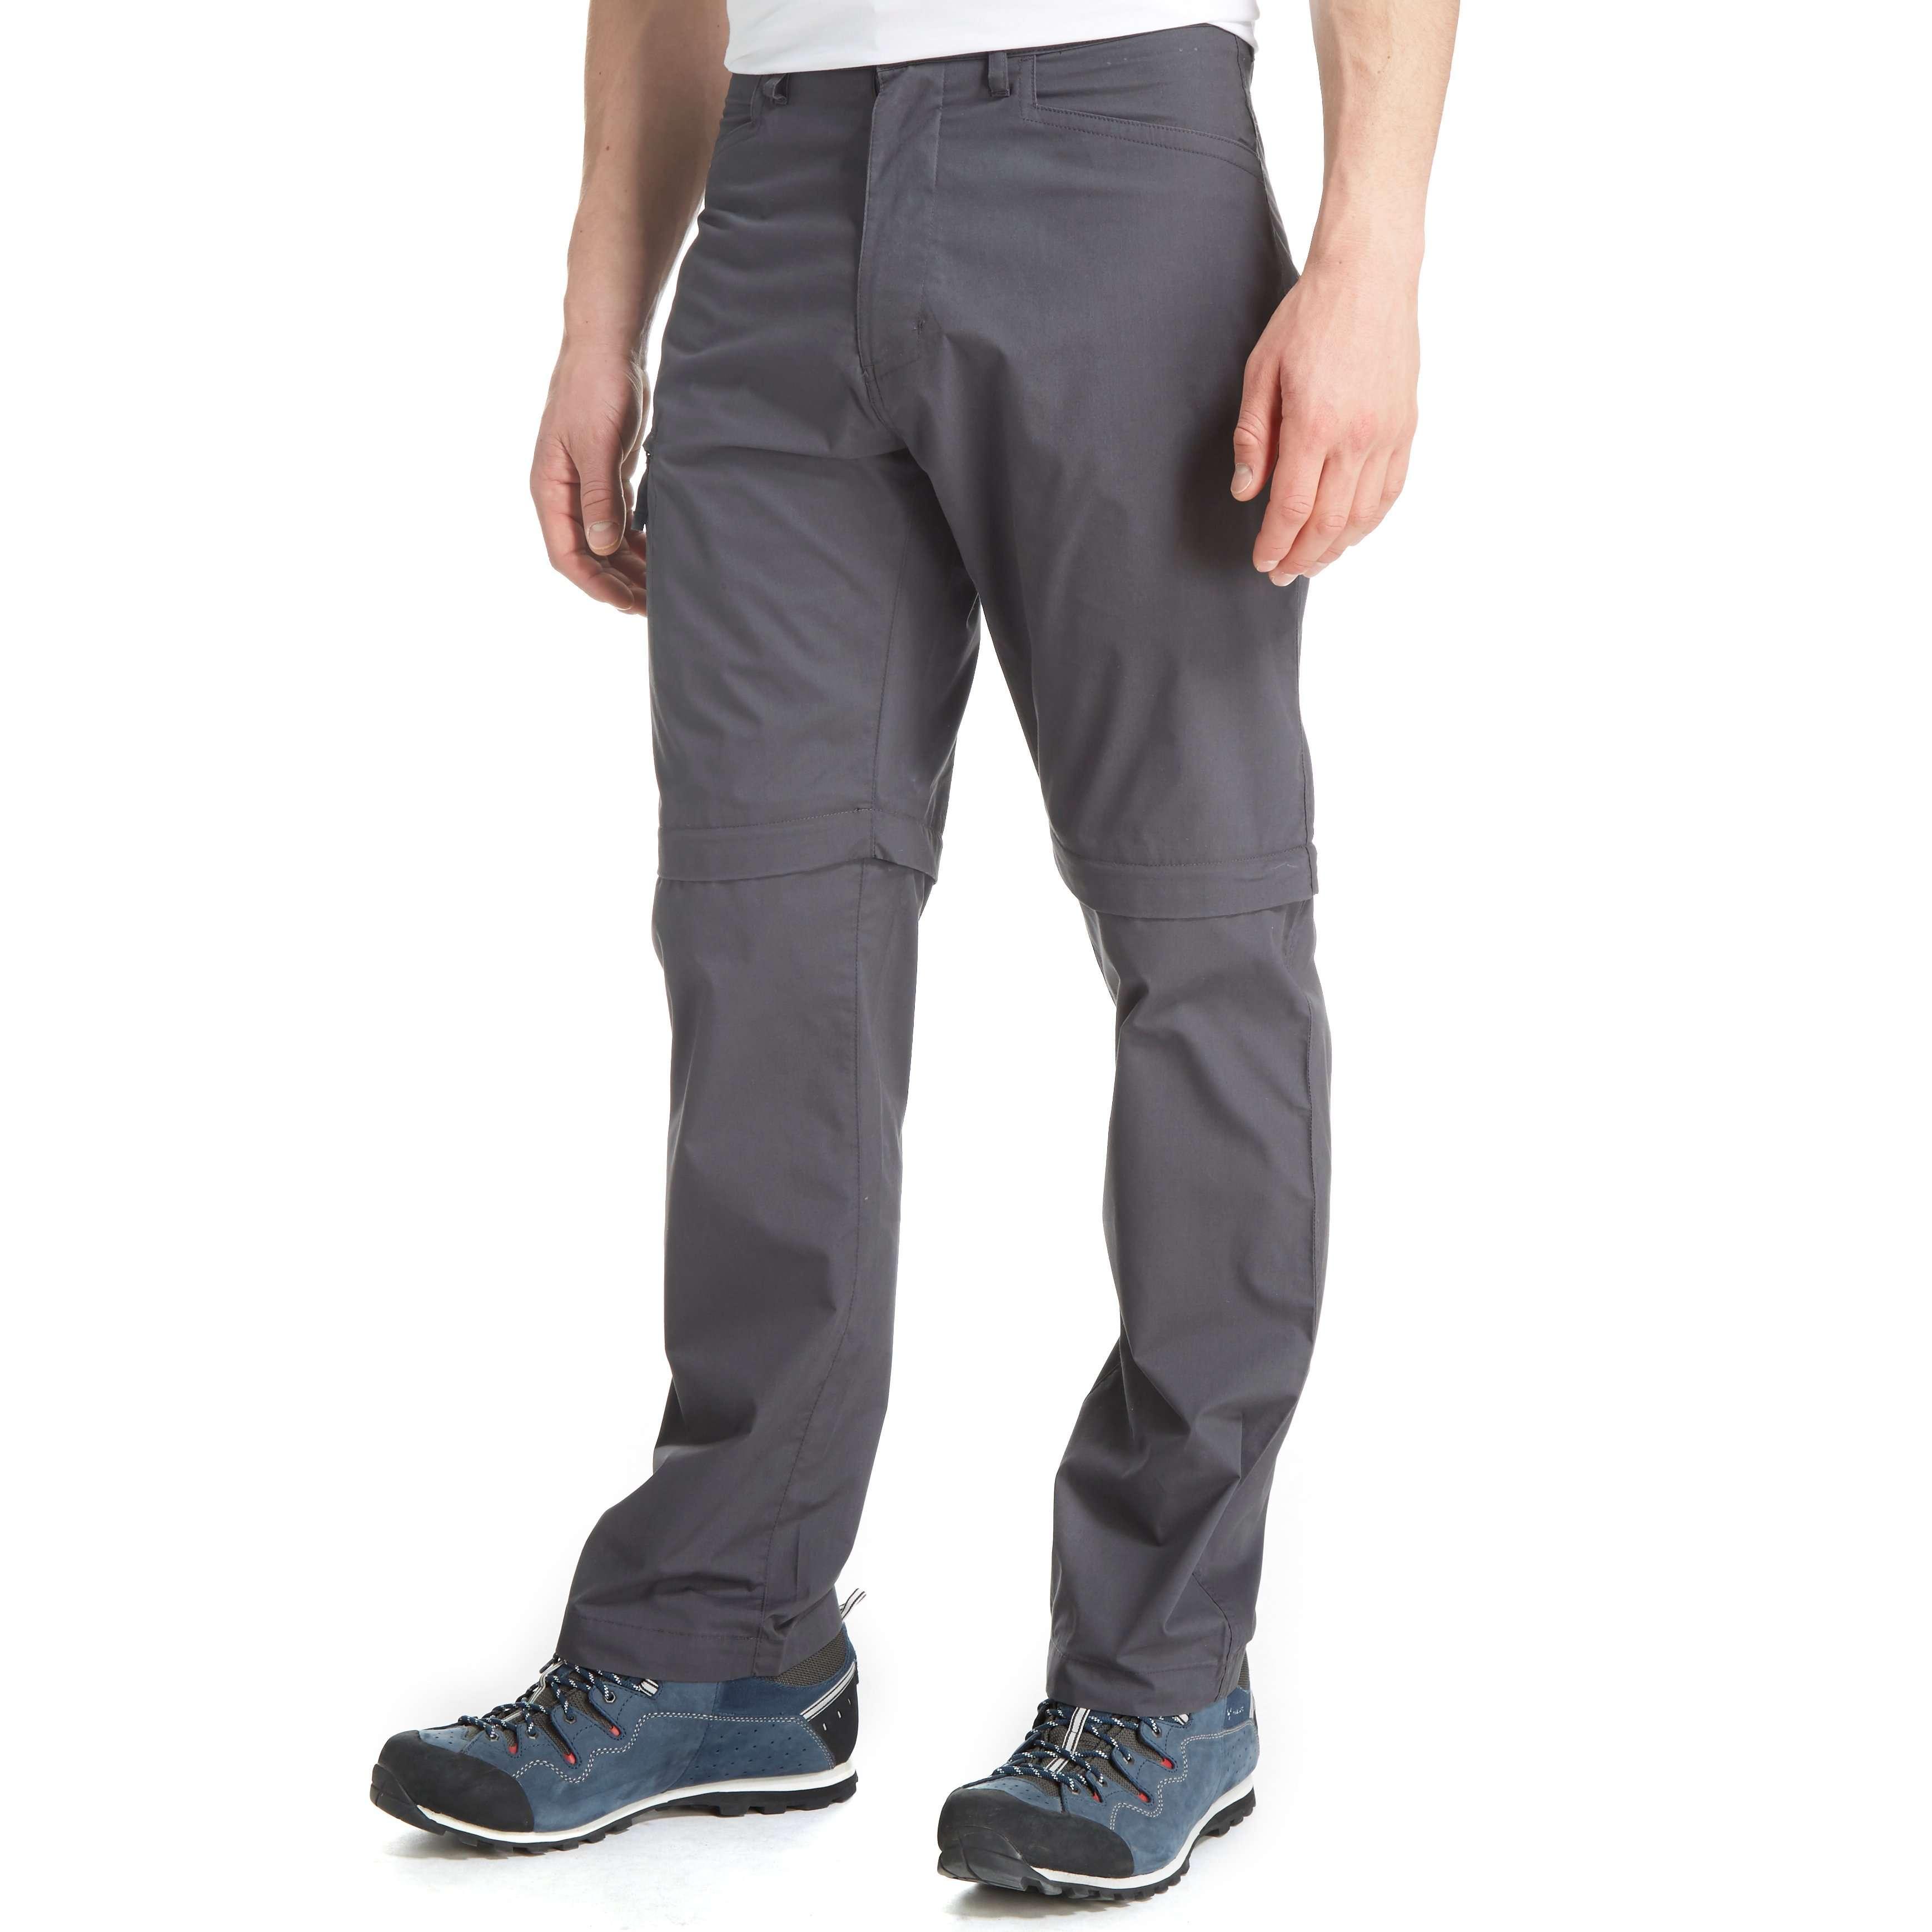 PETER STORM Men's Ramble Convertible Trousers - Long